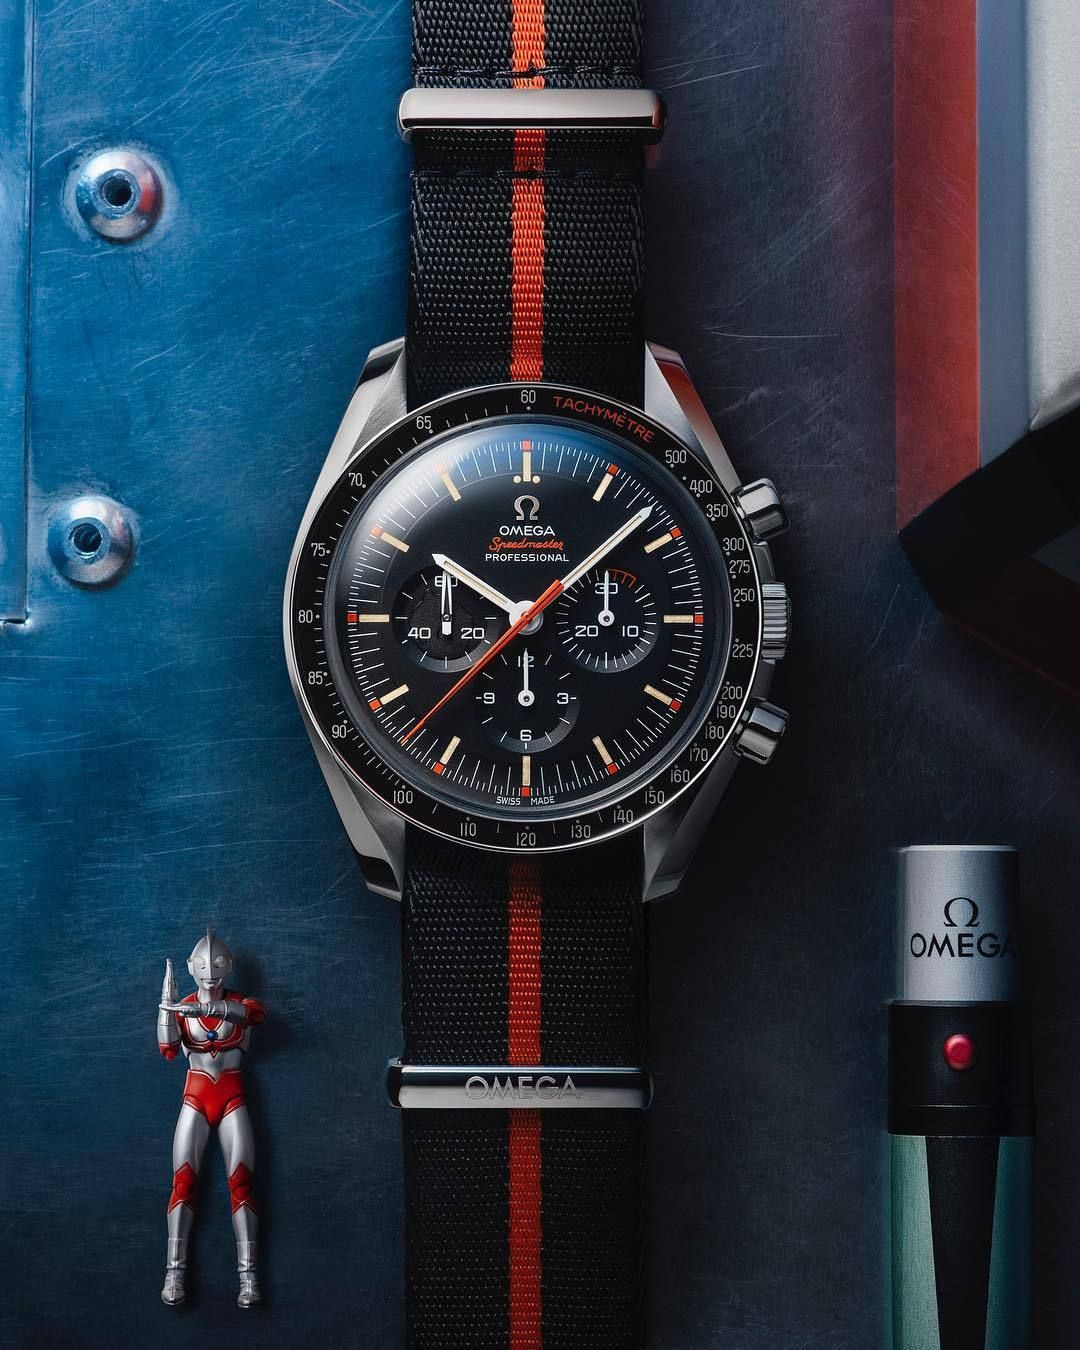 Omega Speedmaster Ultraman Limited Edition Womens Watches Luxury Luxury Watches For Men Omega Speedmaster